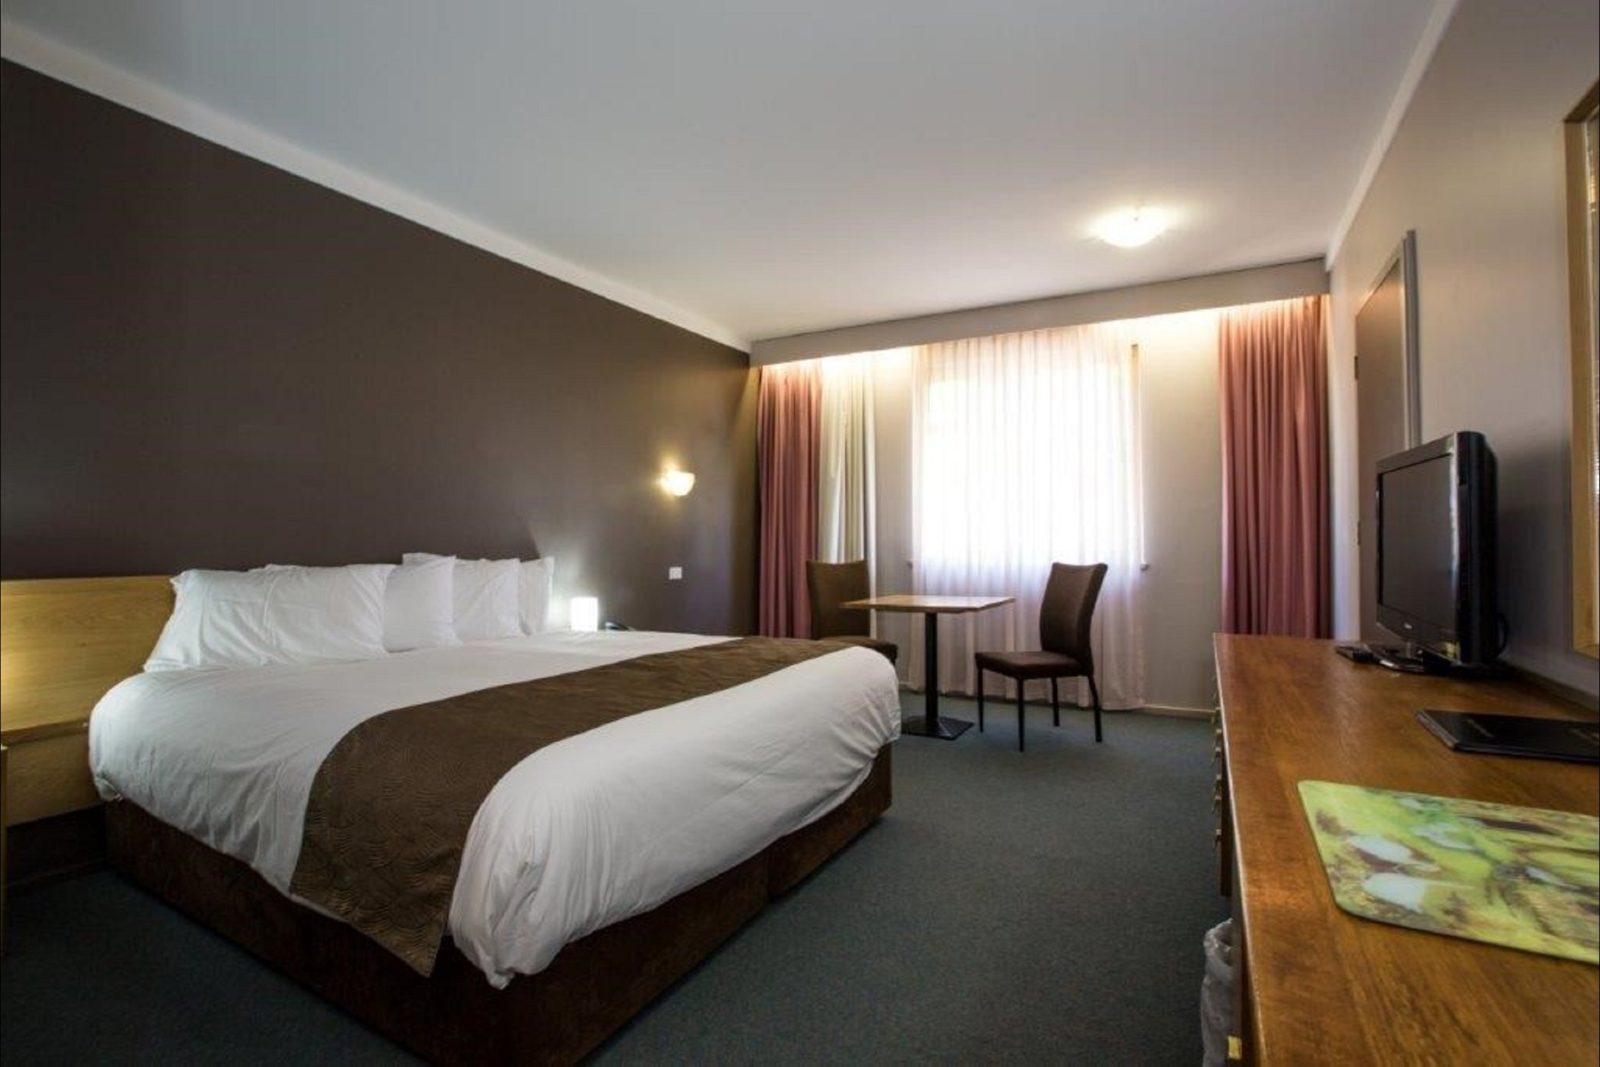 Best Western Hospitality Inn Kalgoorlie, Kalgoolie, Western Australia